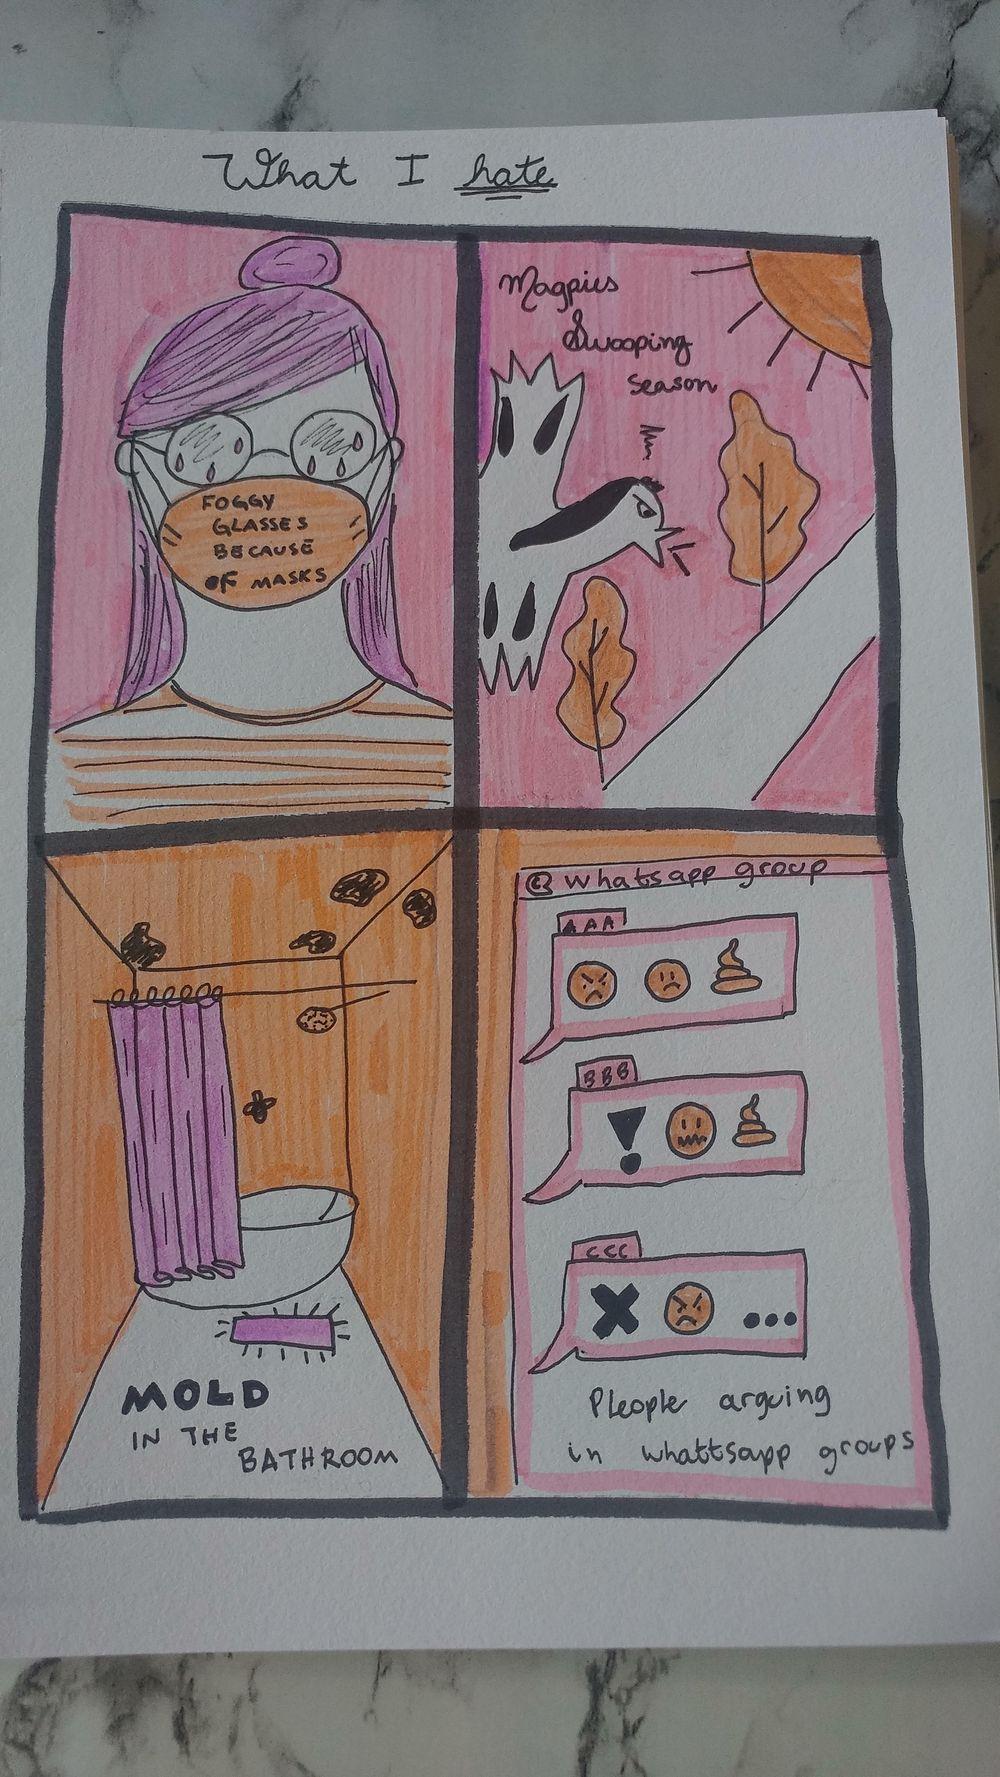 Sentimental - image 2 - student project